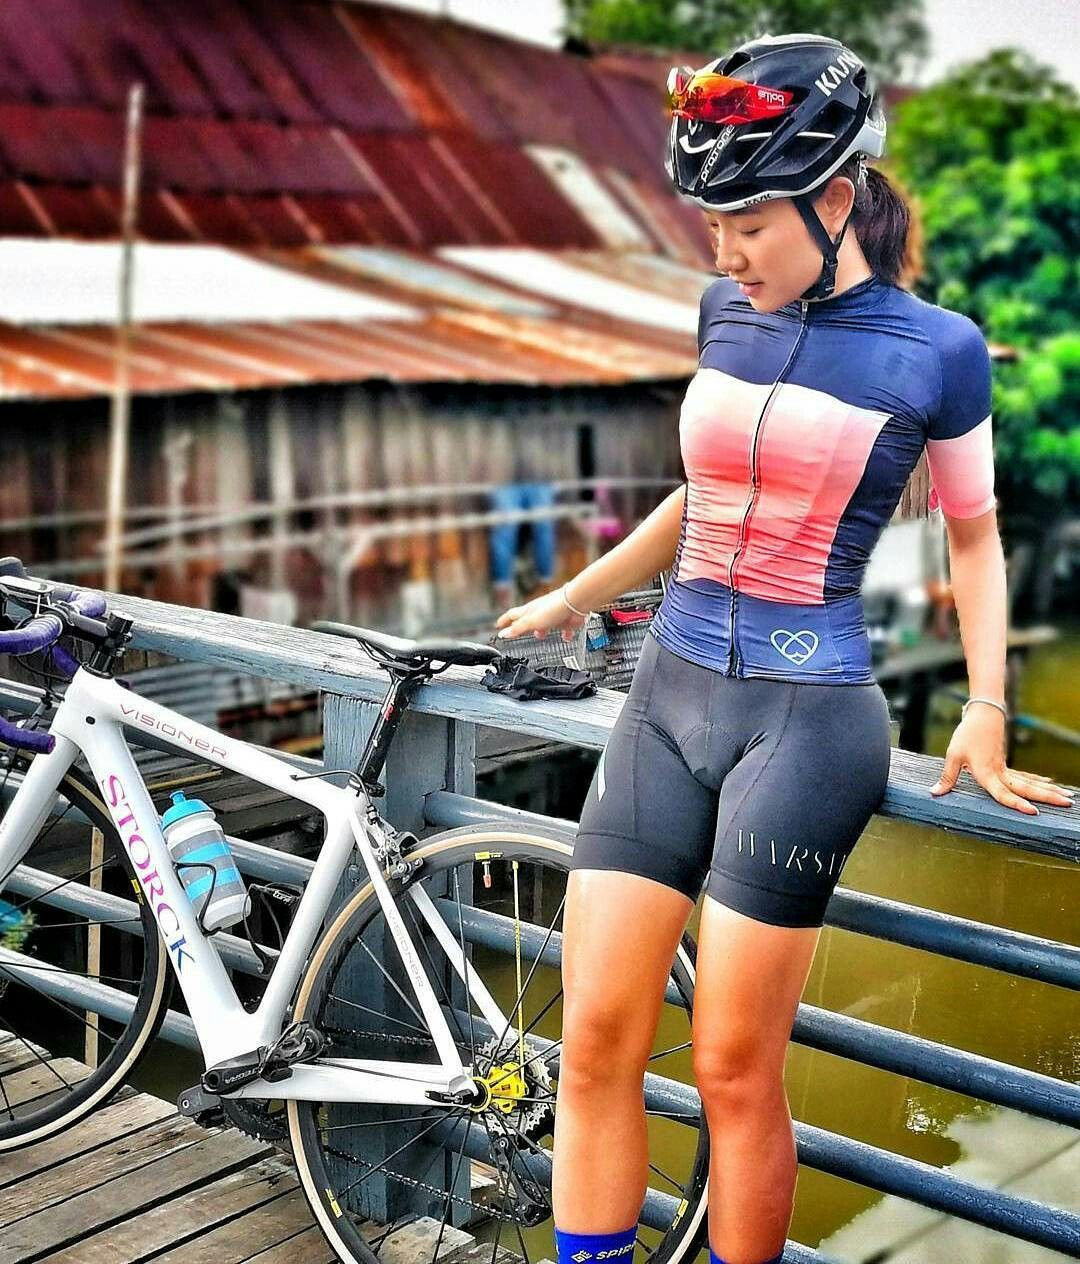 Cycling In Style Bicycle Girl Cycling Girls Cycling Women